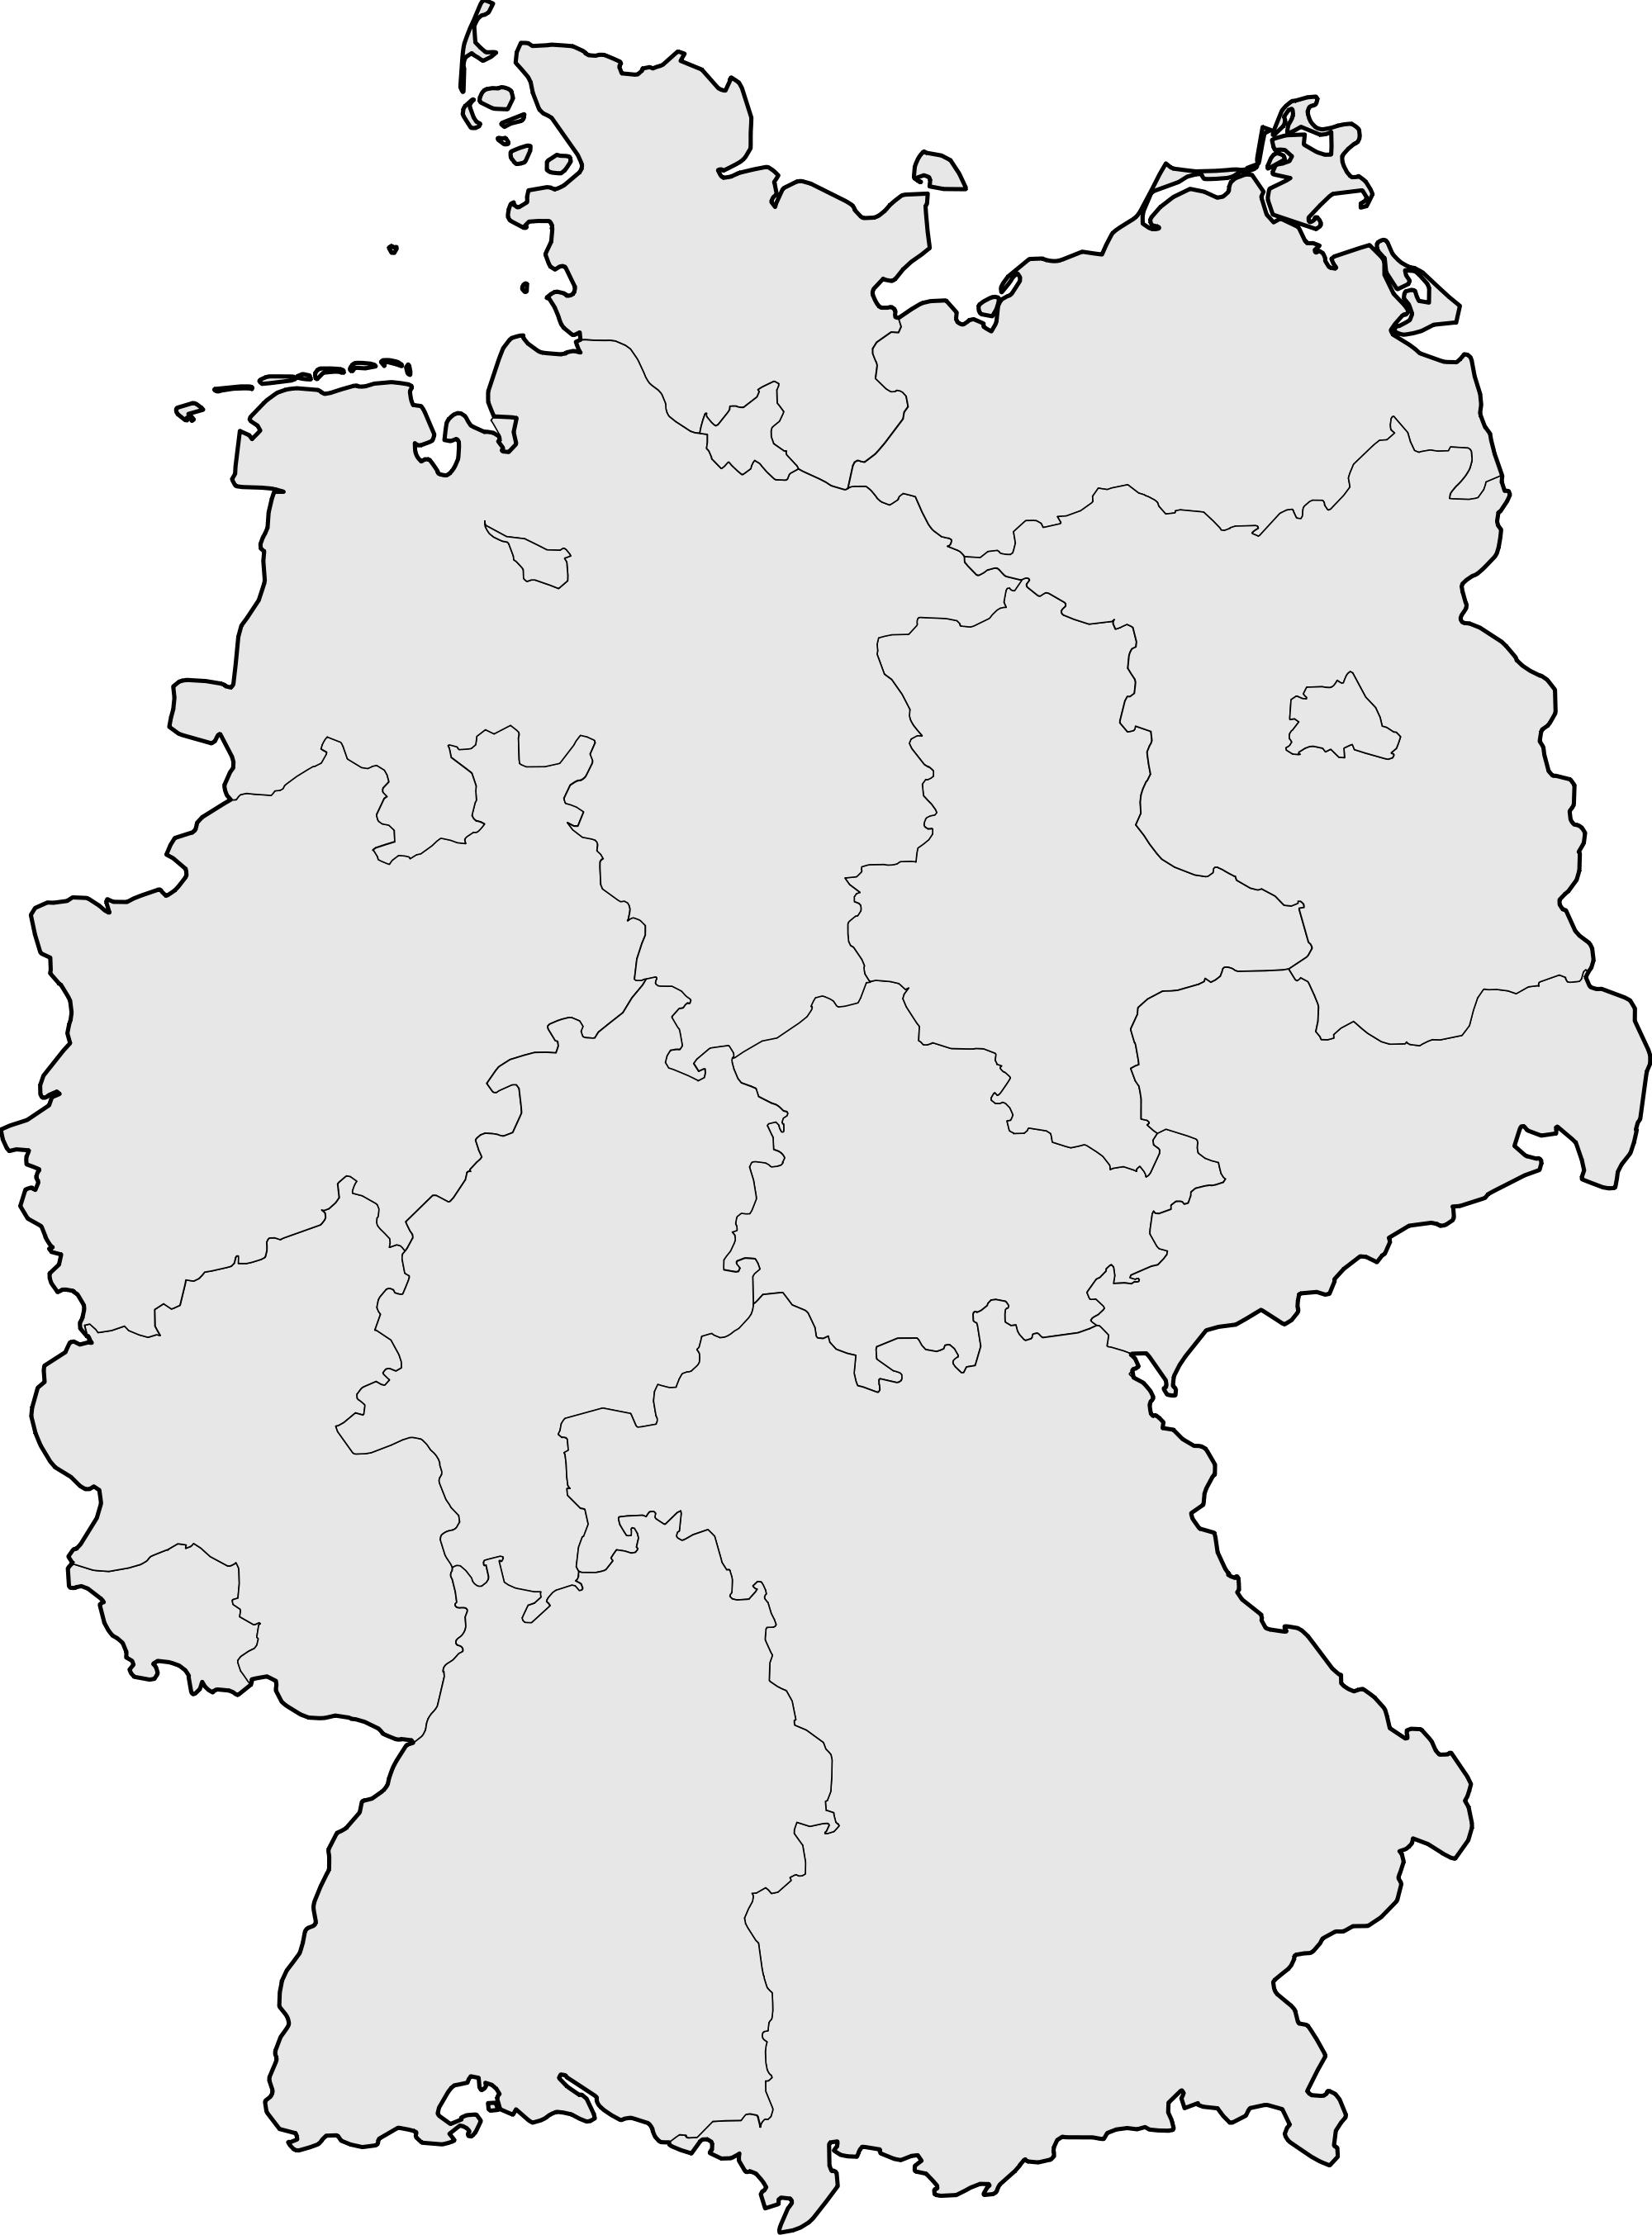 Germany Blank Map • Mapsof.net.